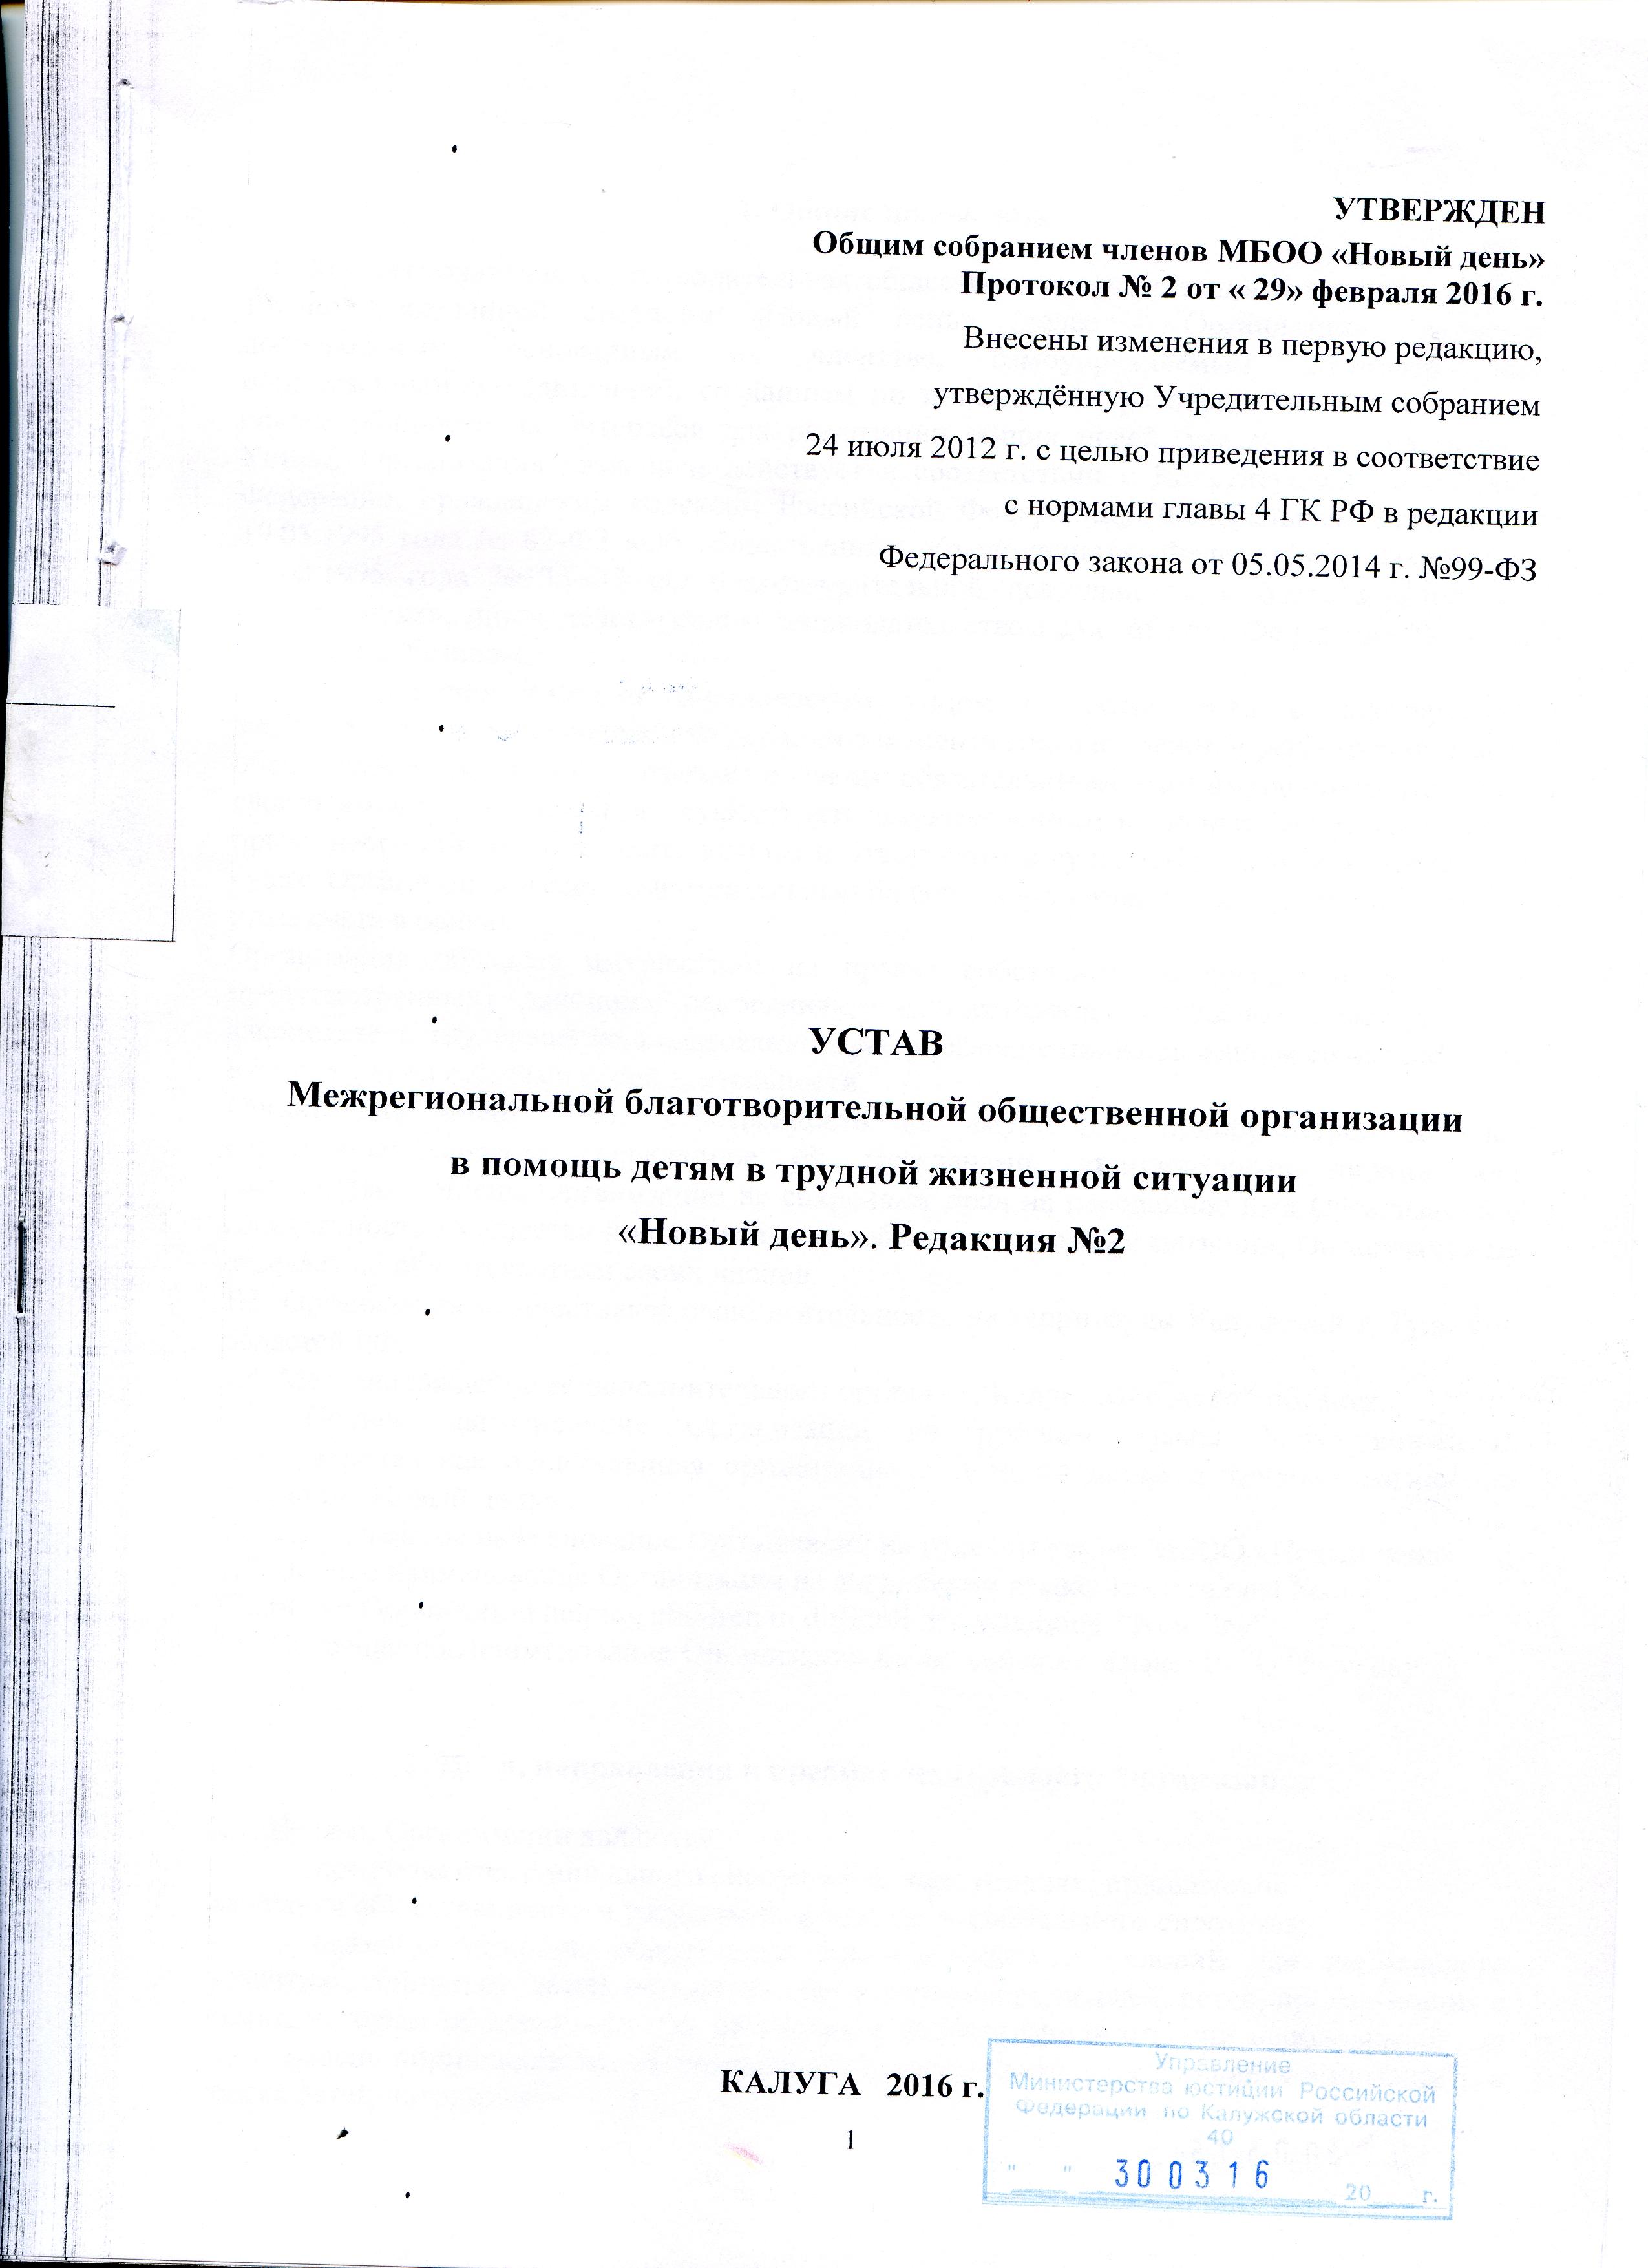 Устав НД 2 редакция061